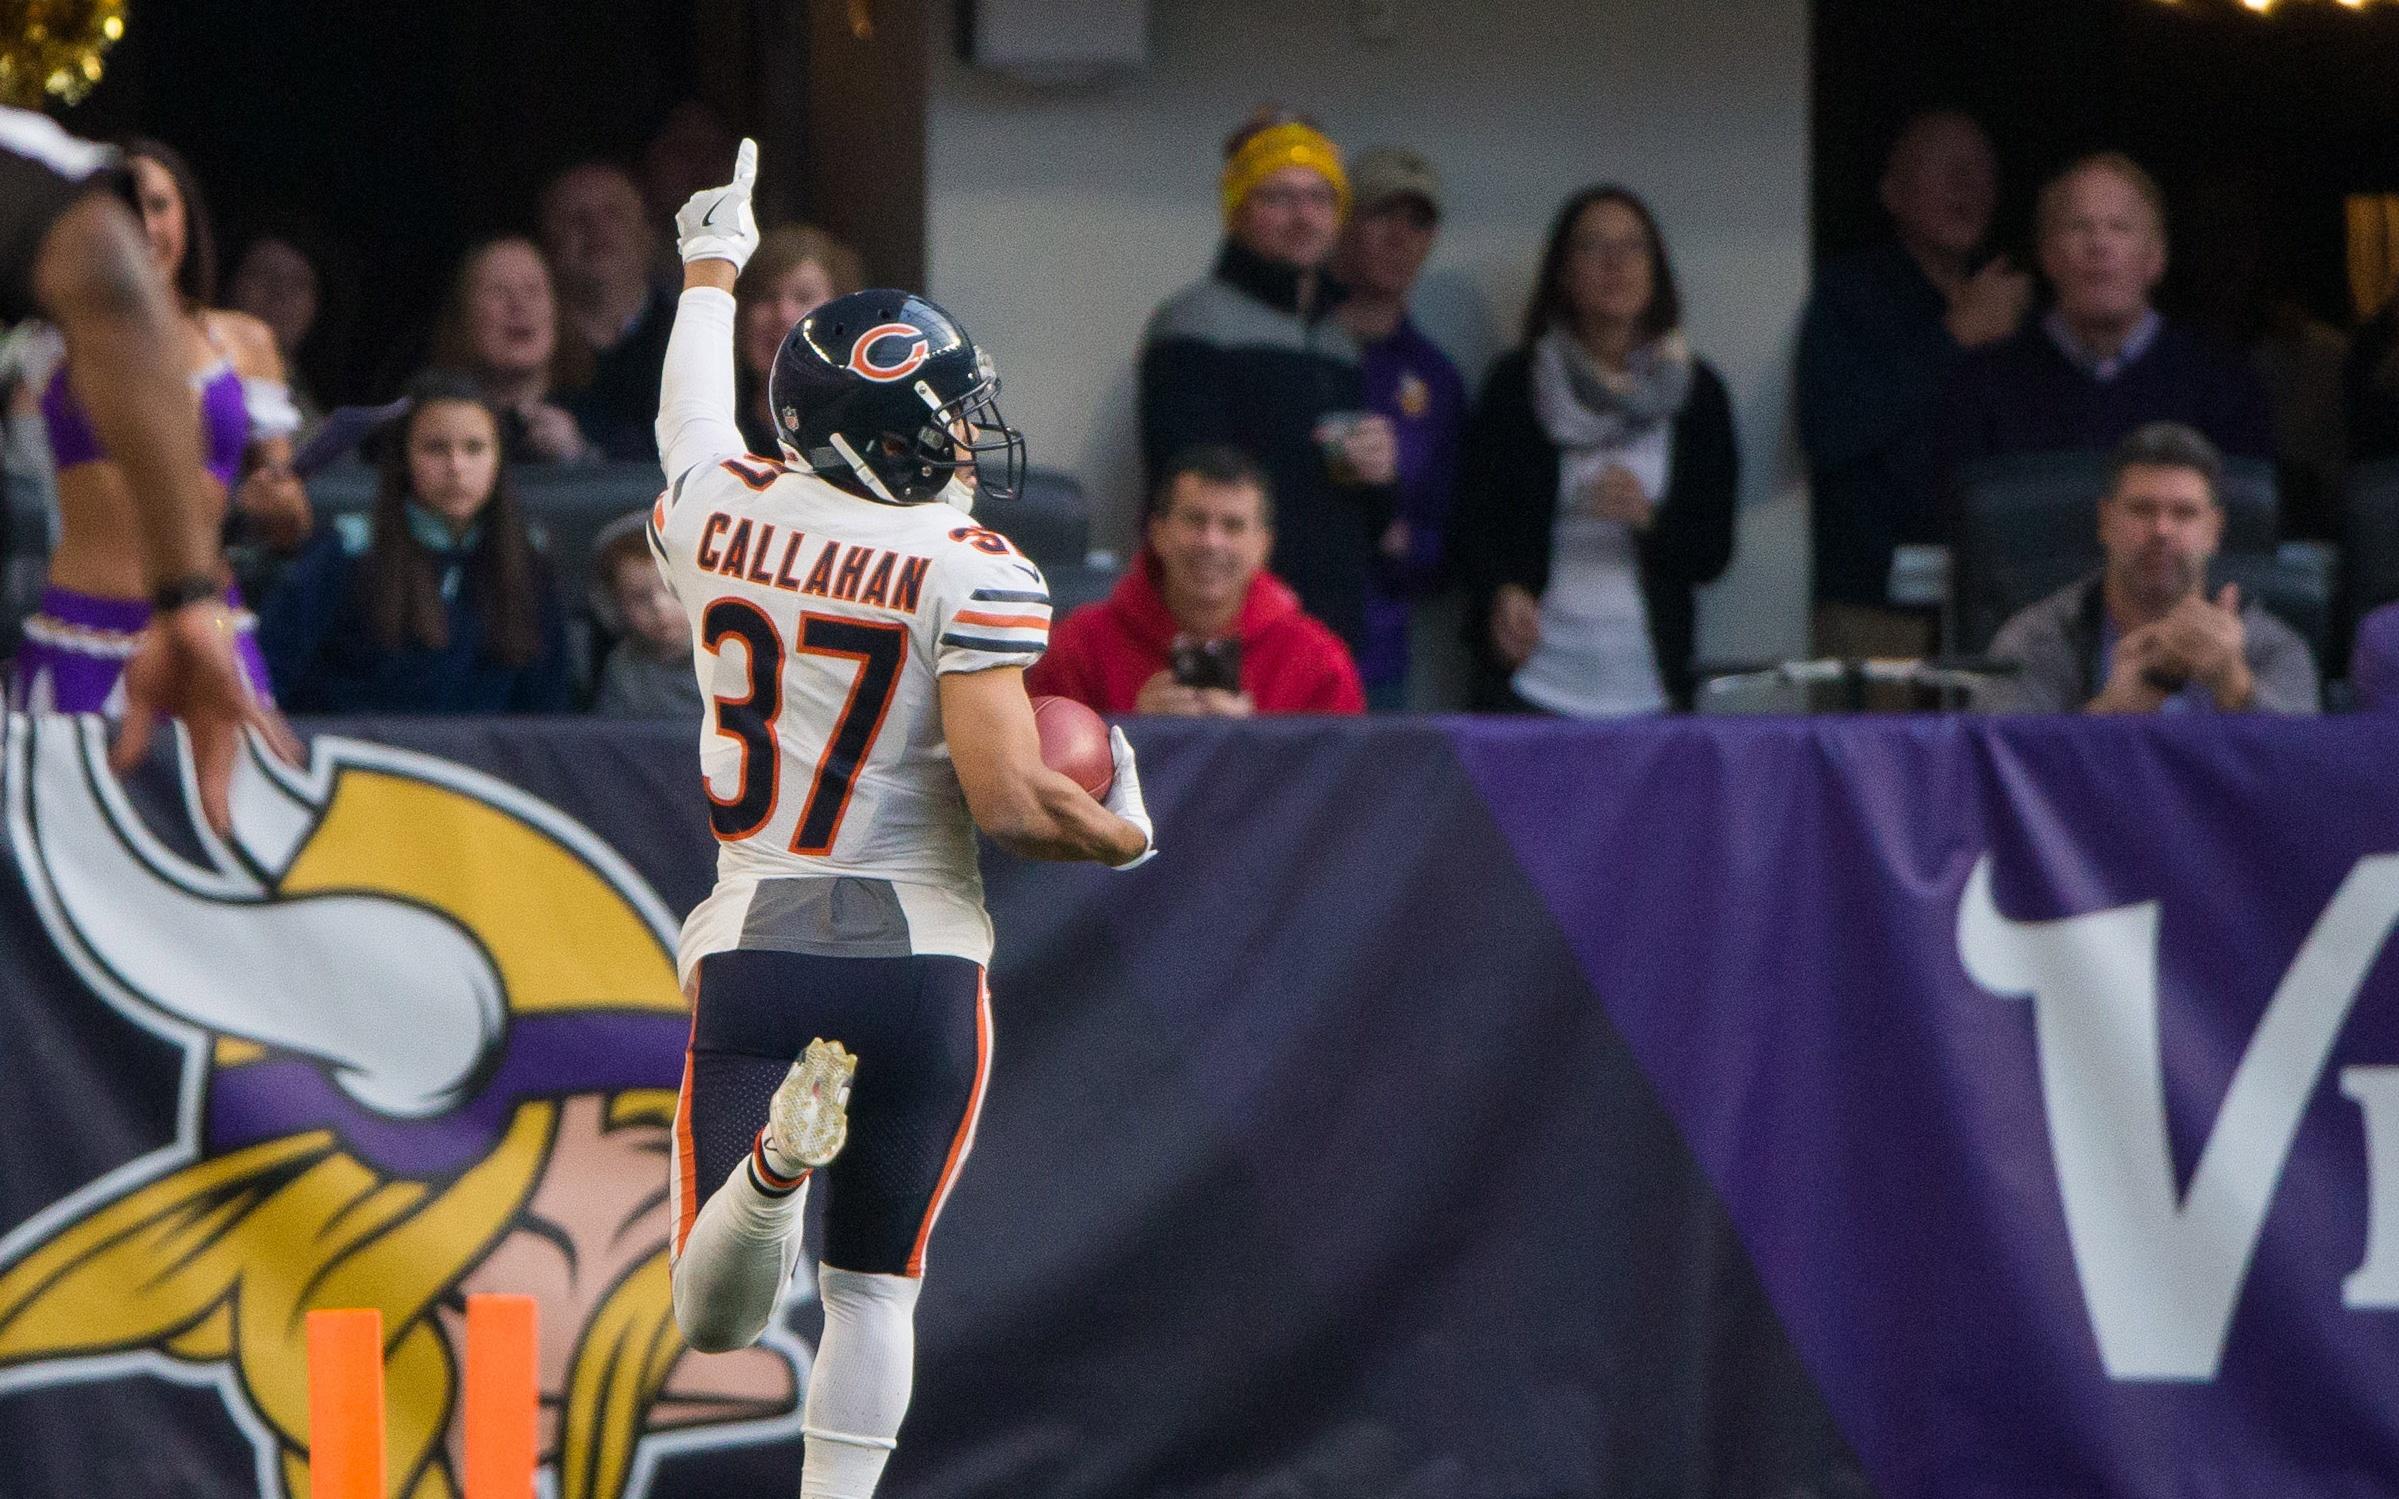 Bryce Callahan. Credit: Brad Rempel, USA Today Sports.